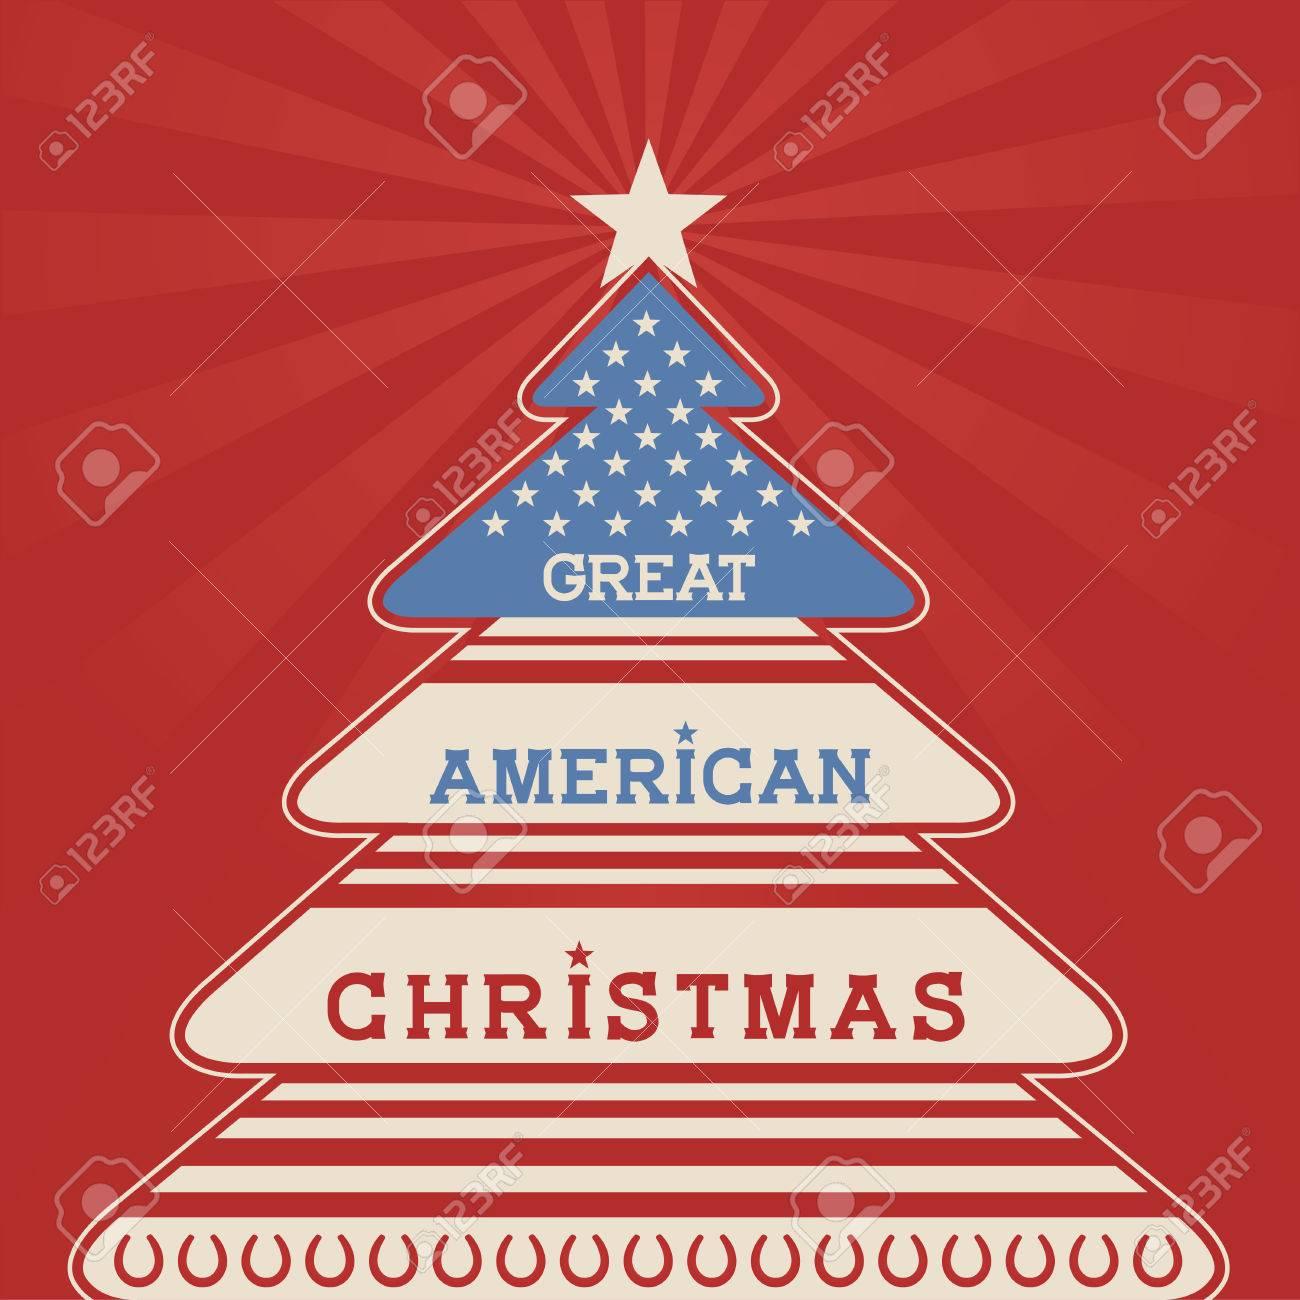 Patriotic Christmas Background.American Christmas Tree Poster Background With Patriotic Elements